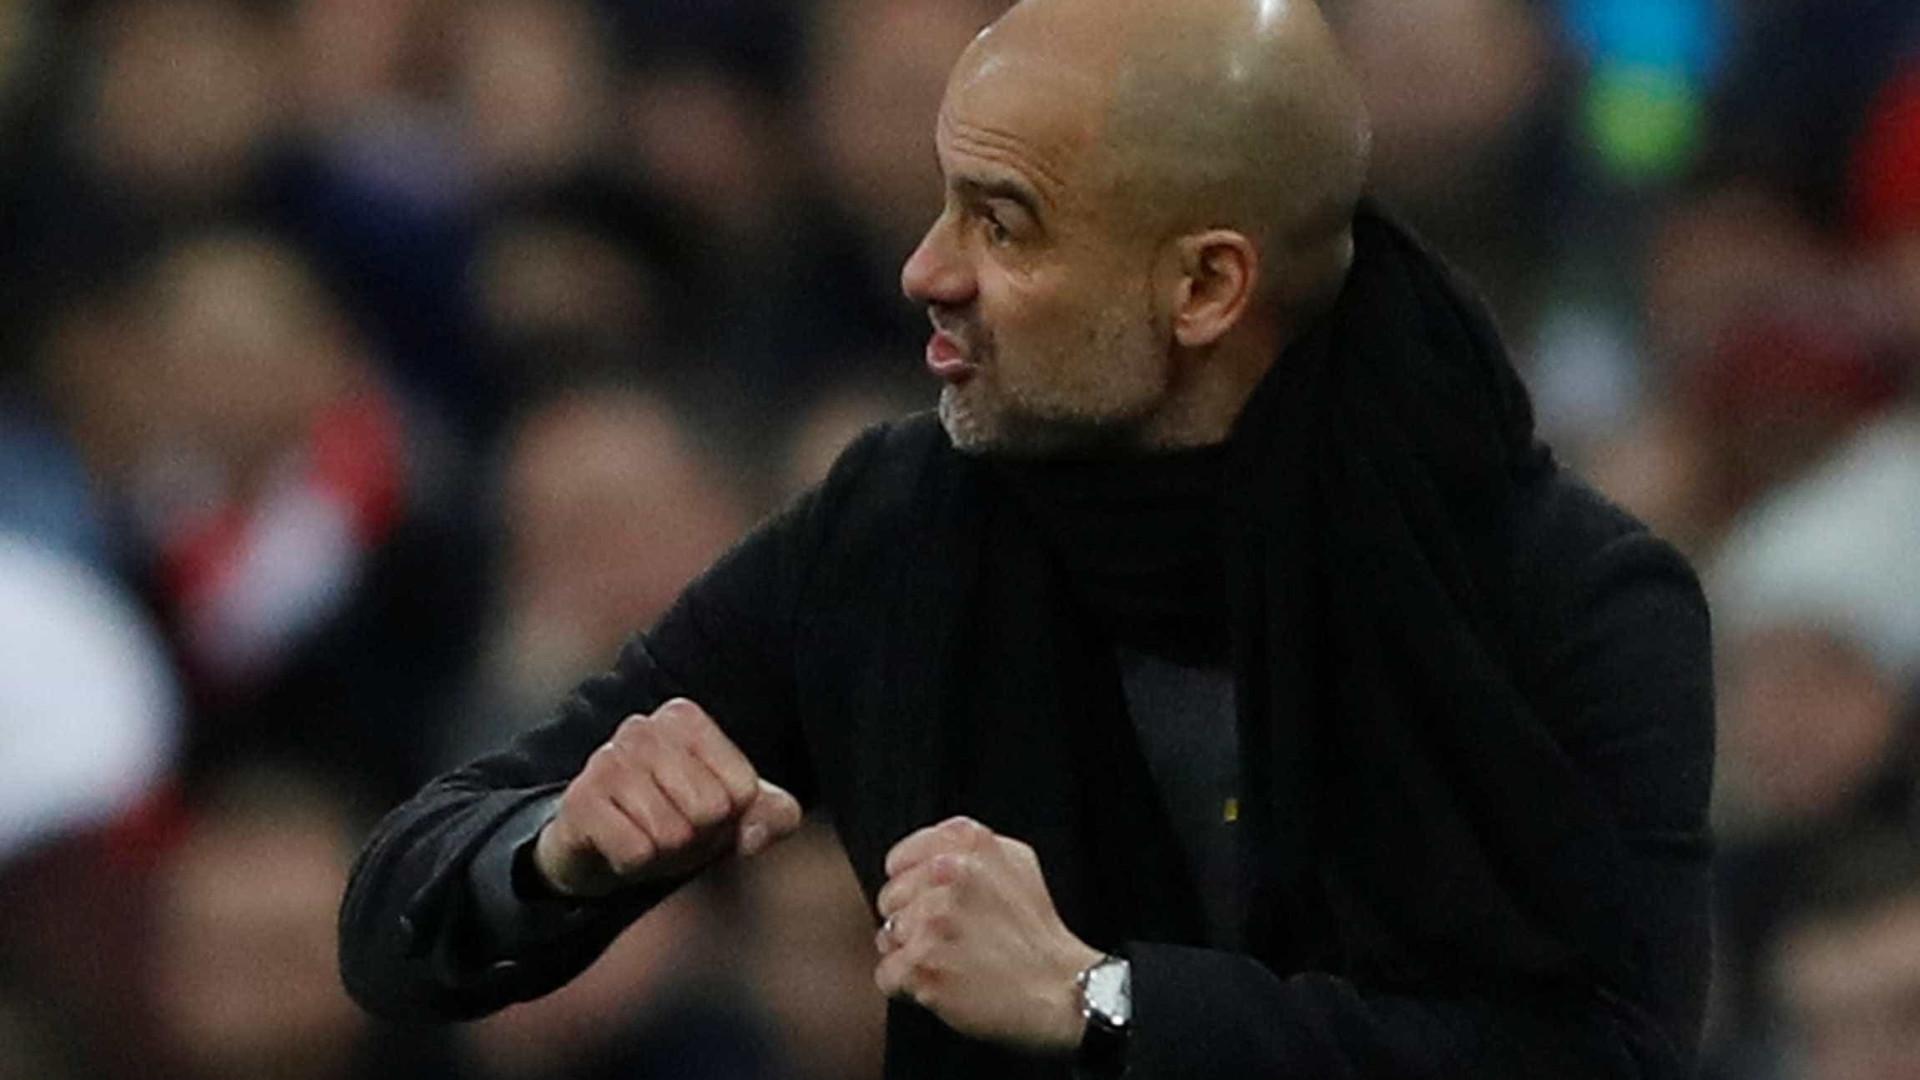 O 23.º título que coloca Guardiola no top-5 dos treinadores europeus